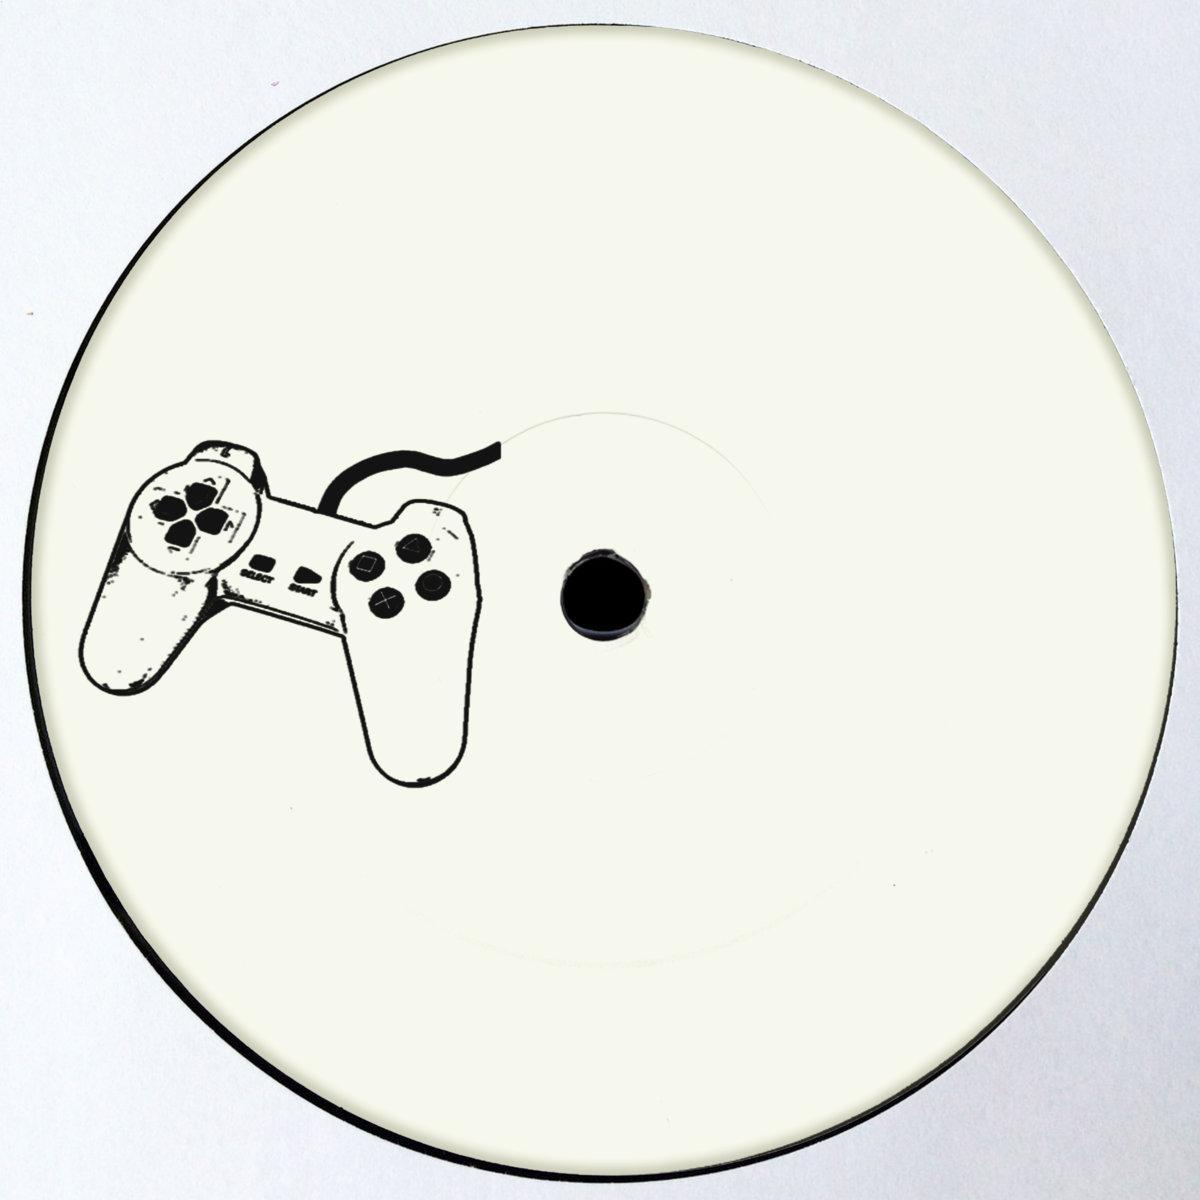 "90s Living EP by Bakground & Sangam (10"" Vinyl - LTWHT018) 1"